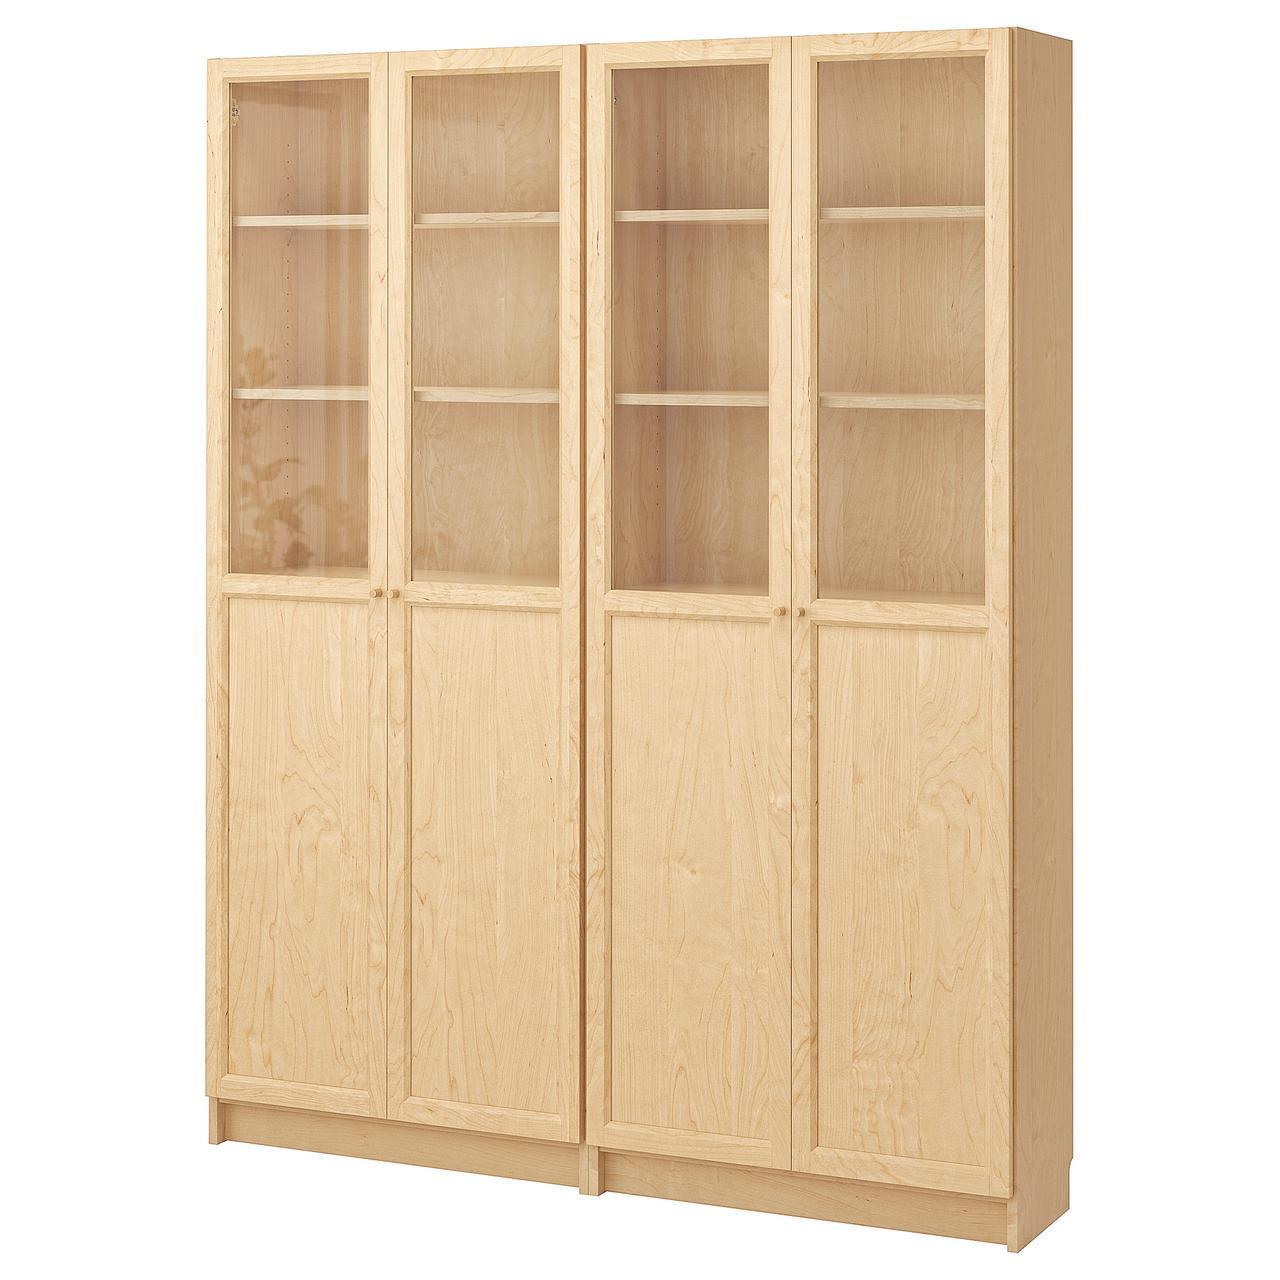 IKEA BILLY/OXBERG Книжный шкаф, березовый шпон  (190.234.07)